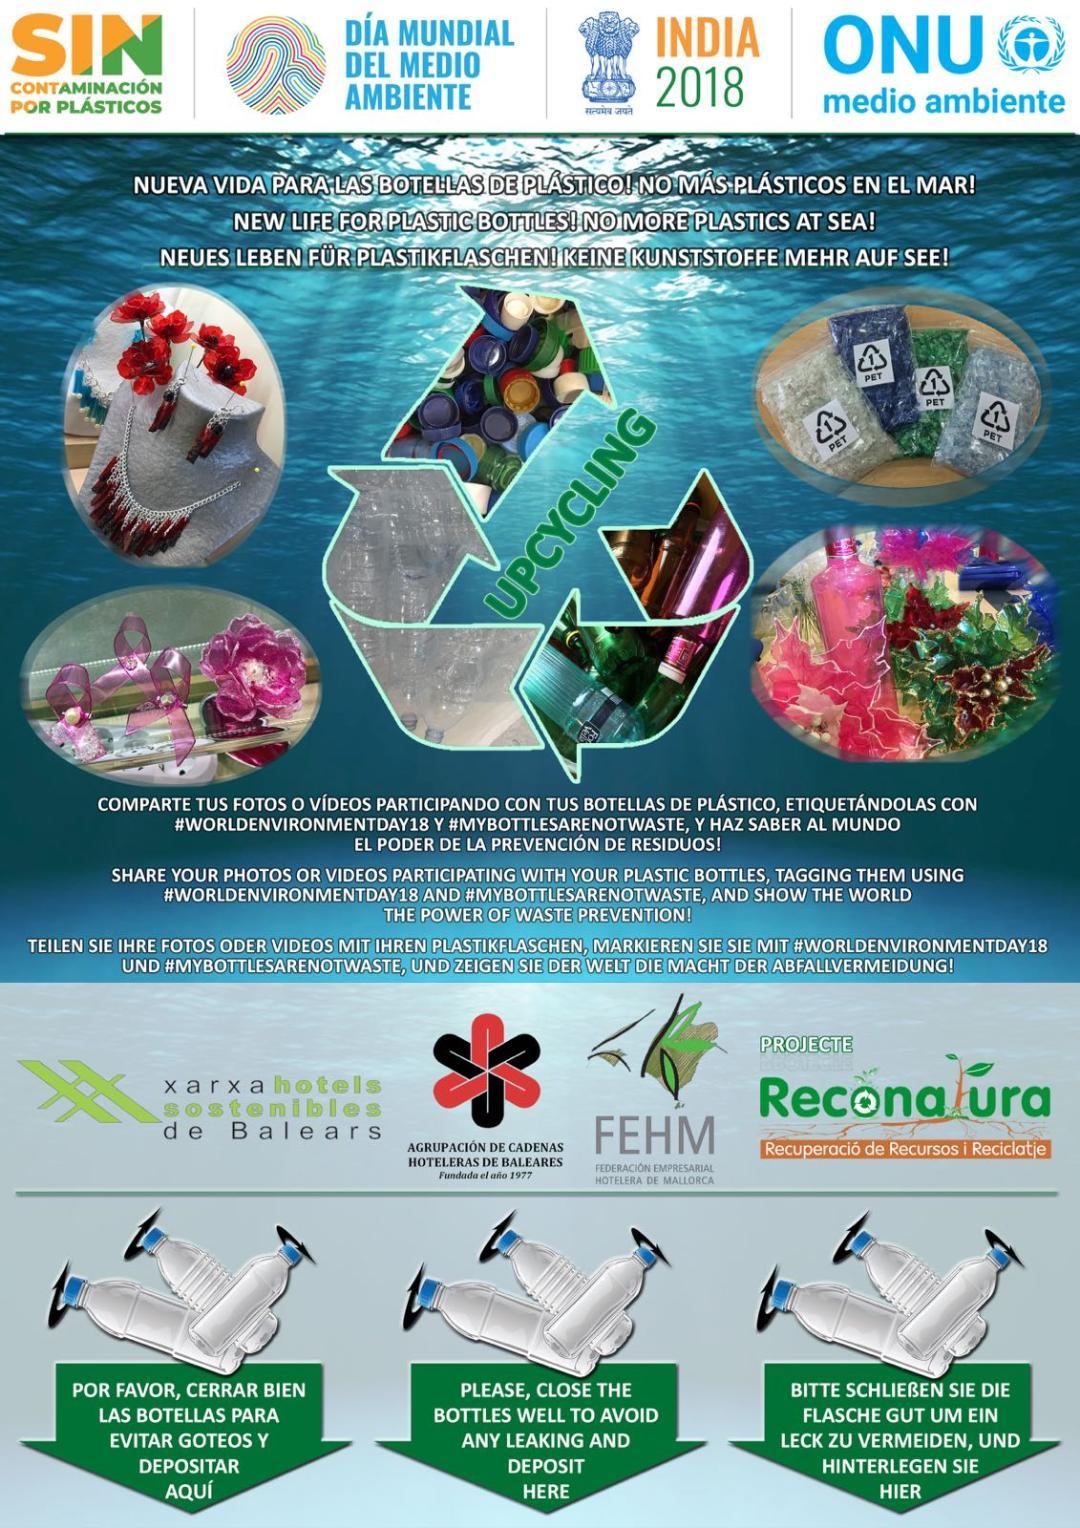 poster-iniciativa-botellas-solo-proyecto-reconatura